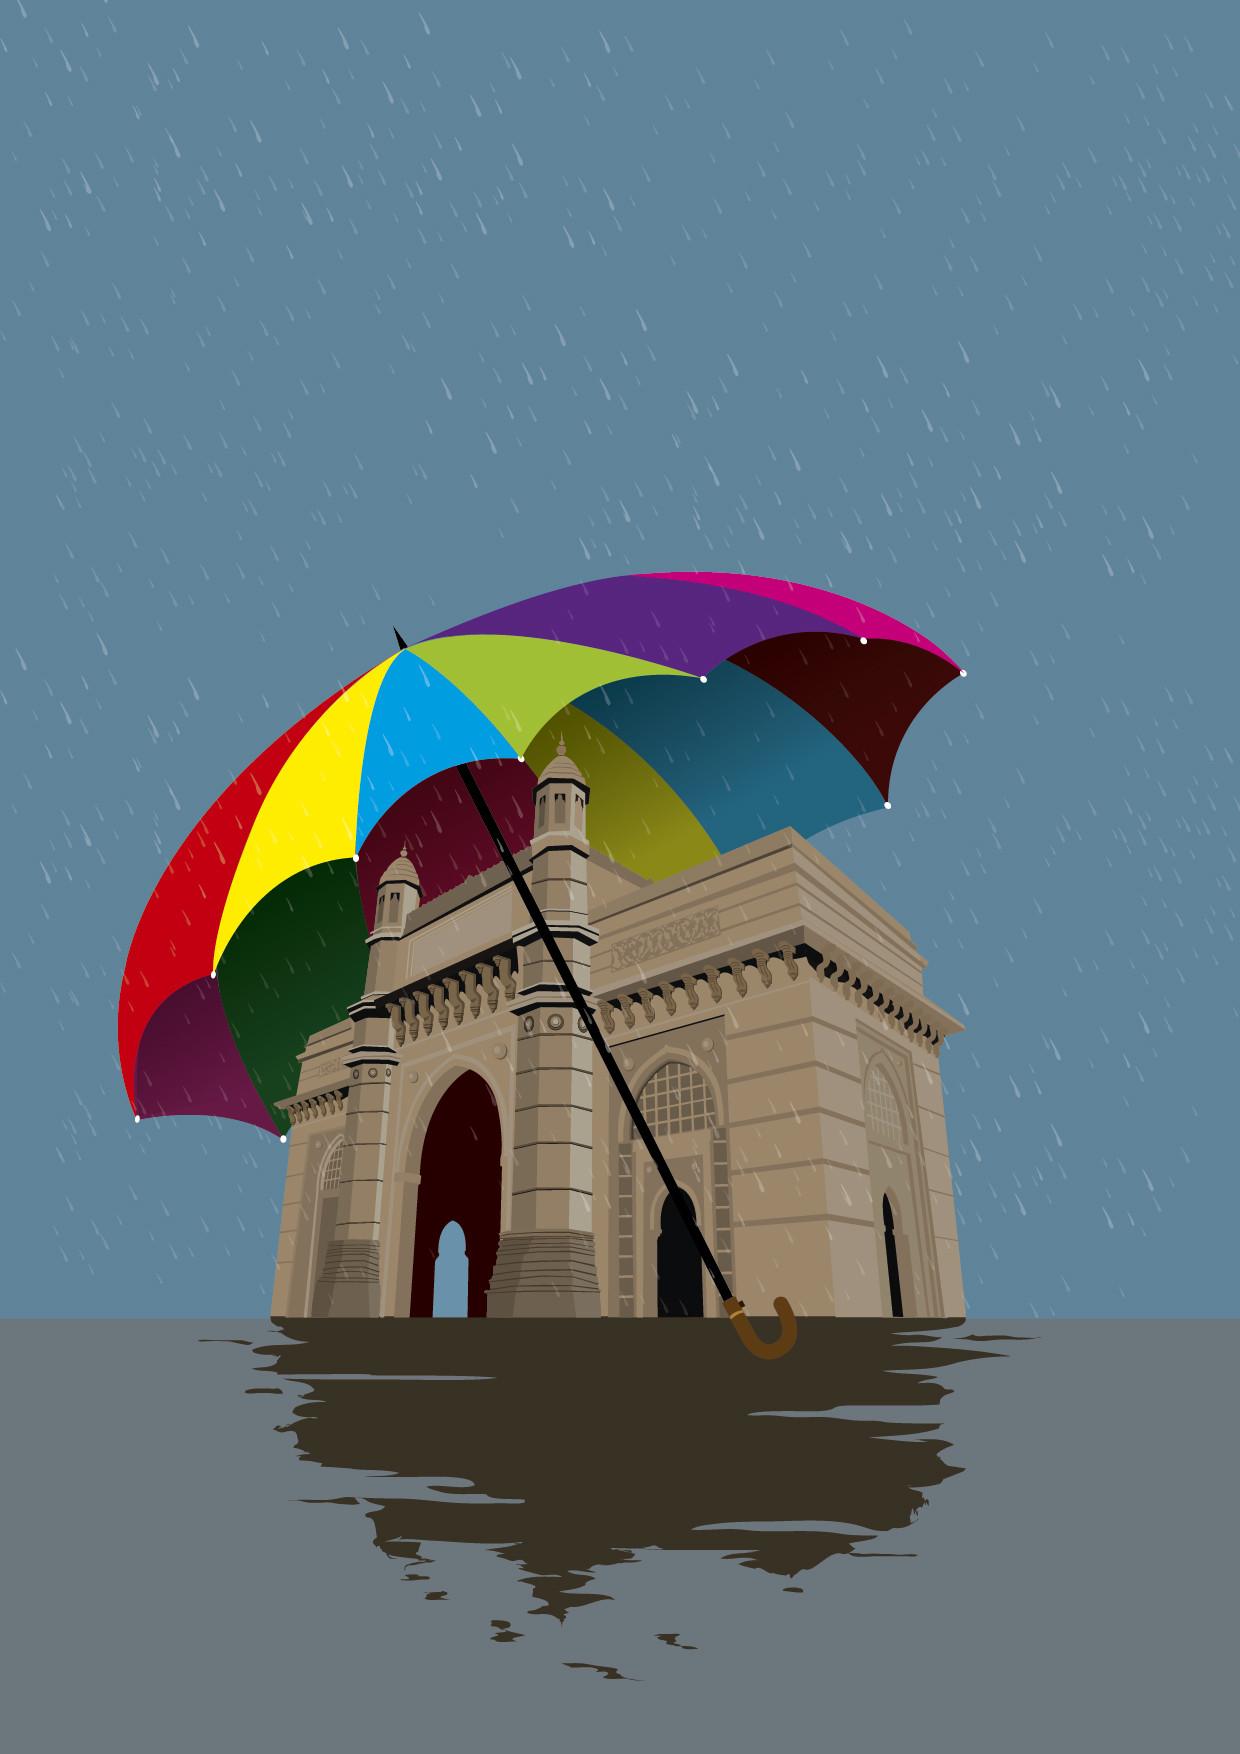 Rajesh sawant gateway in rain 01